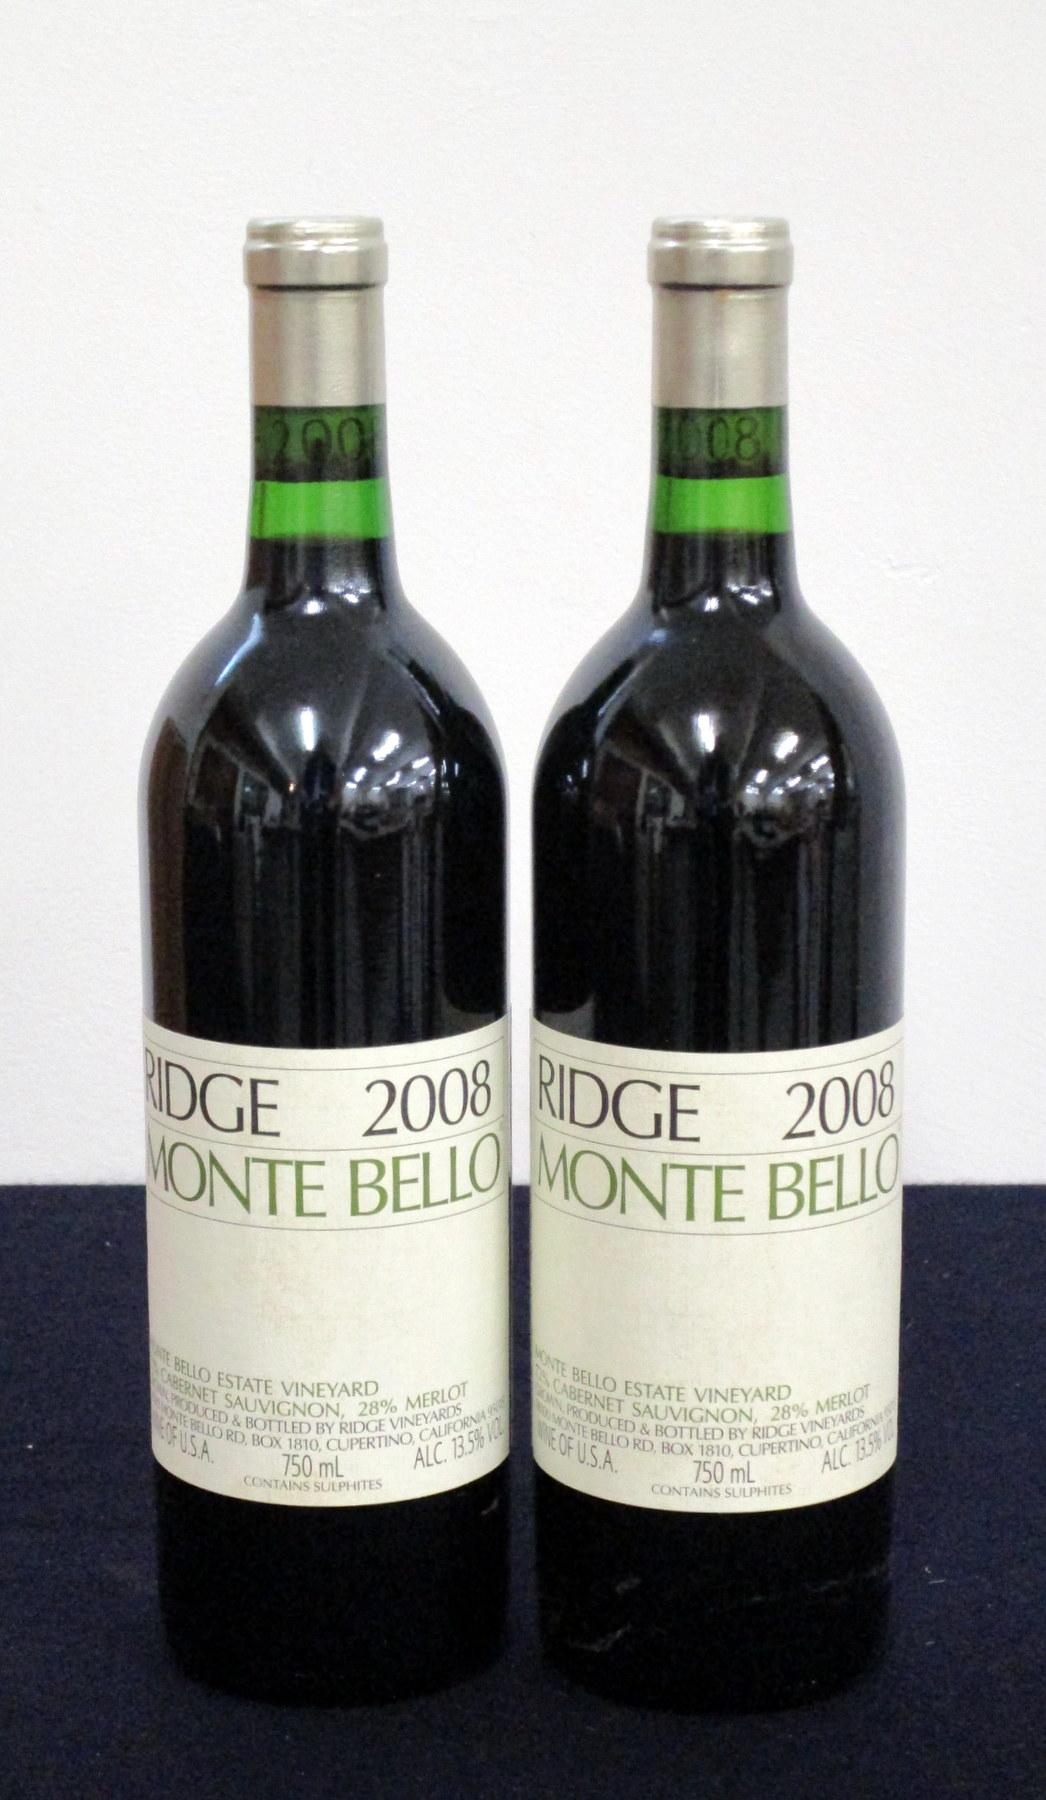 2 bts Ridge Monte Bello 2008 hf/i.n, i.n